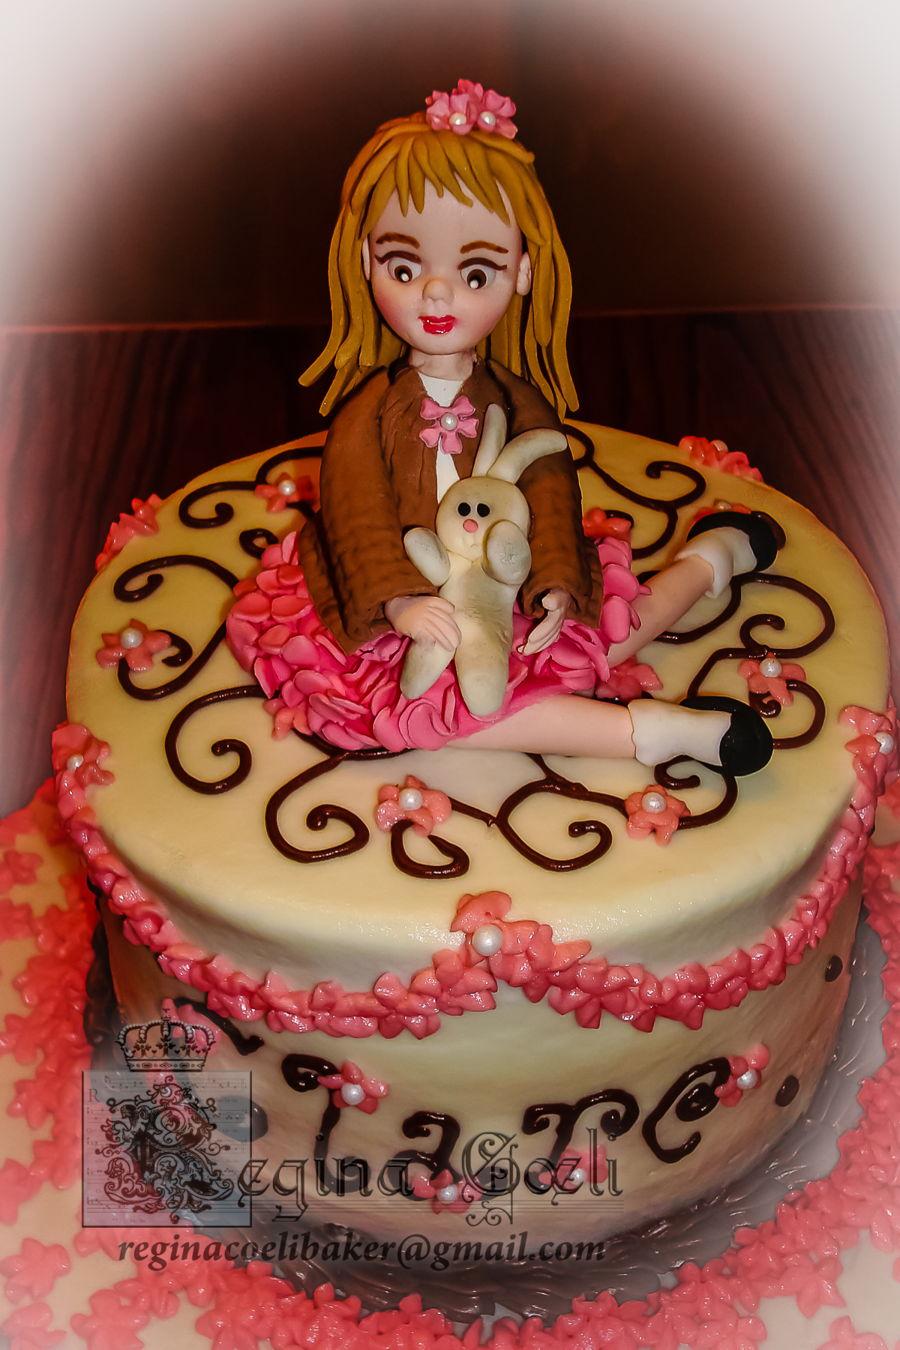 Phenomenal Sweet Girly Birthday Cake Cakecentral Com Personalised Birthday Cards Veneteletsinfo